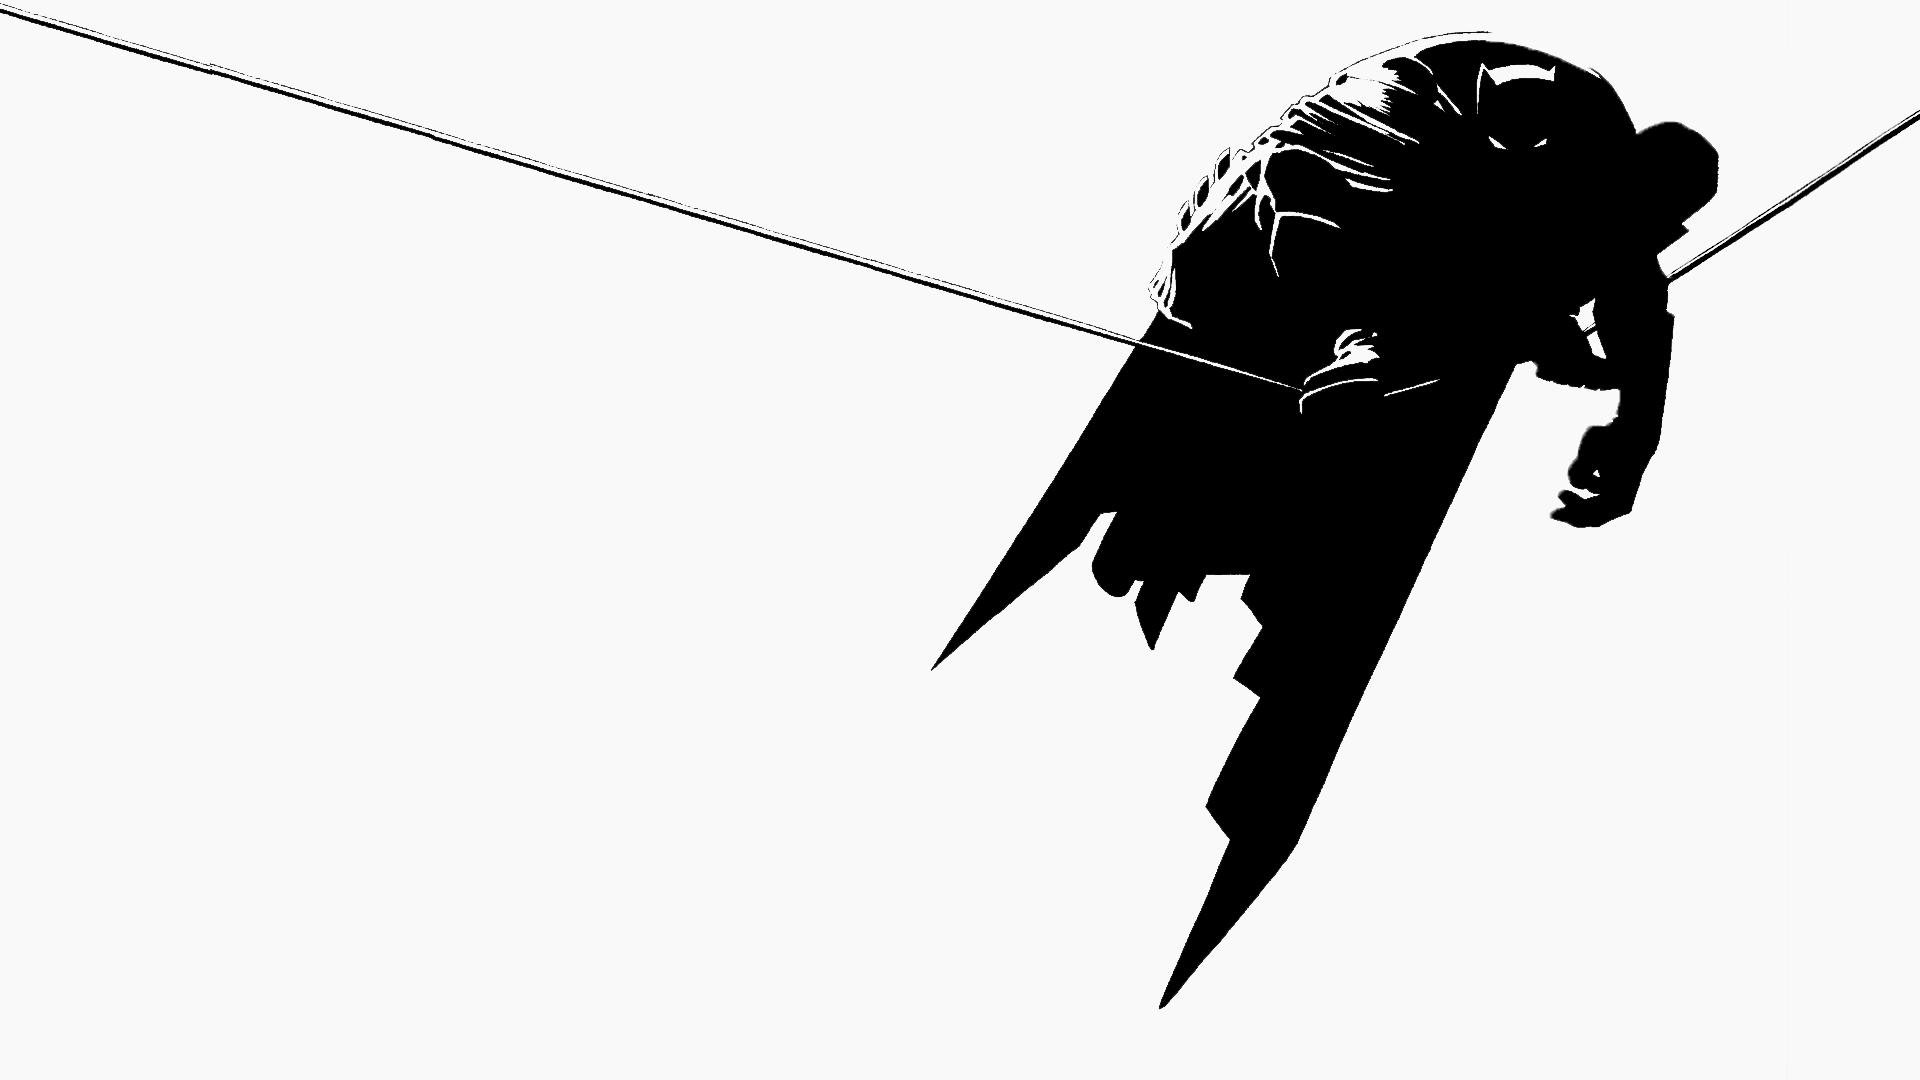 frank miller - batman noir - imgur